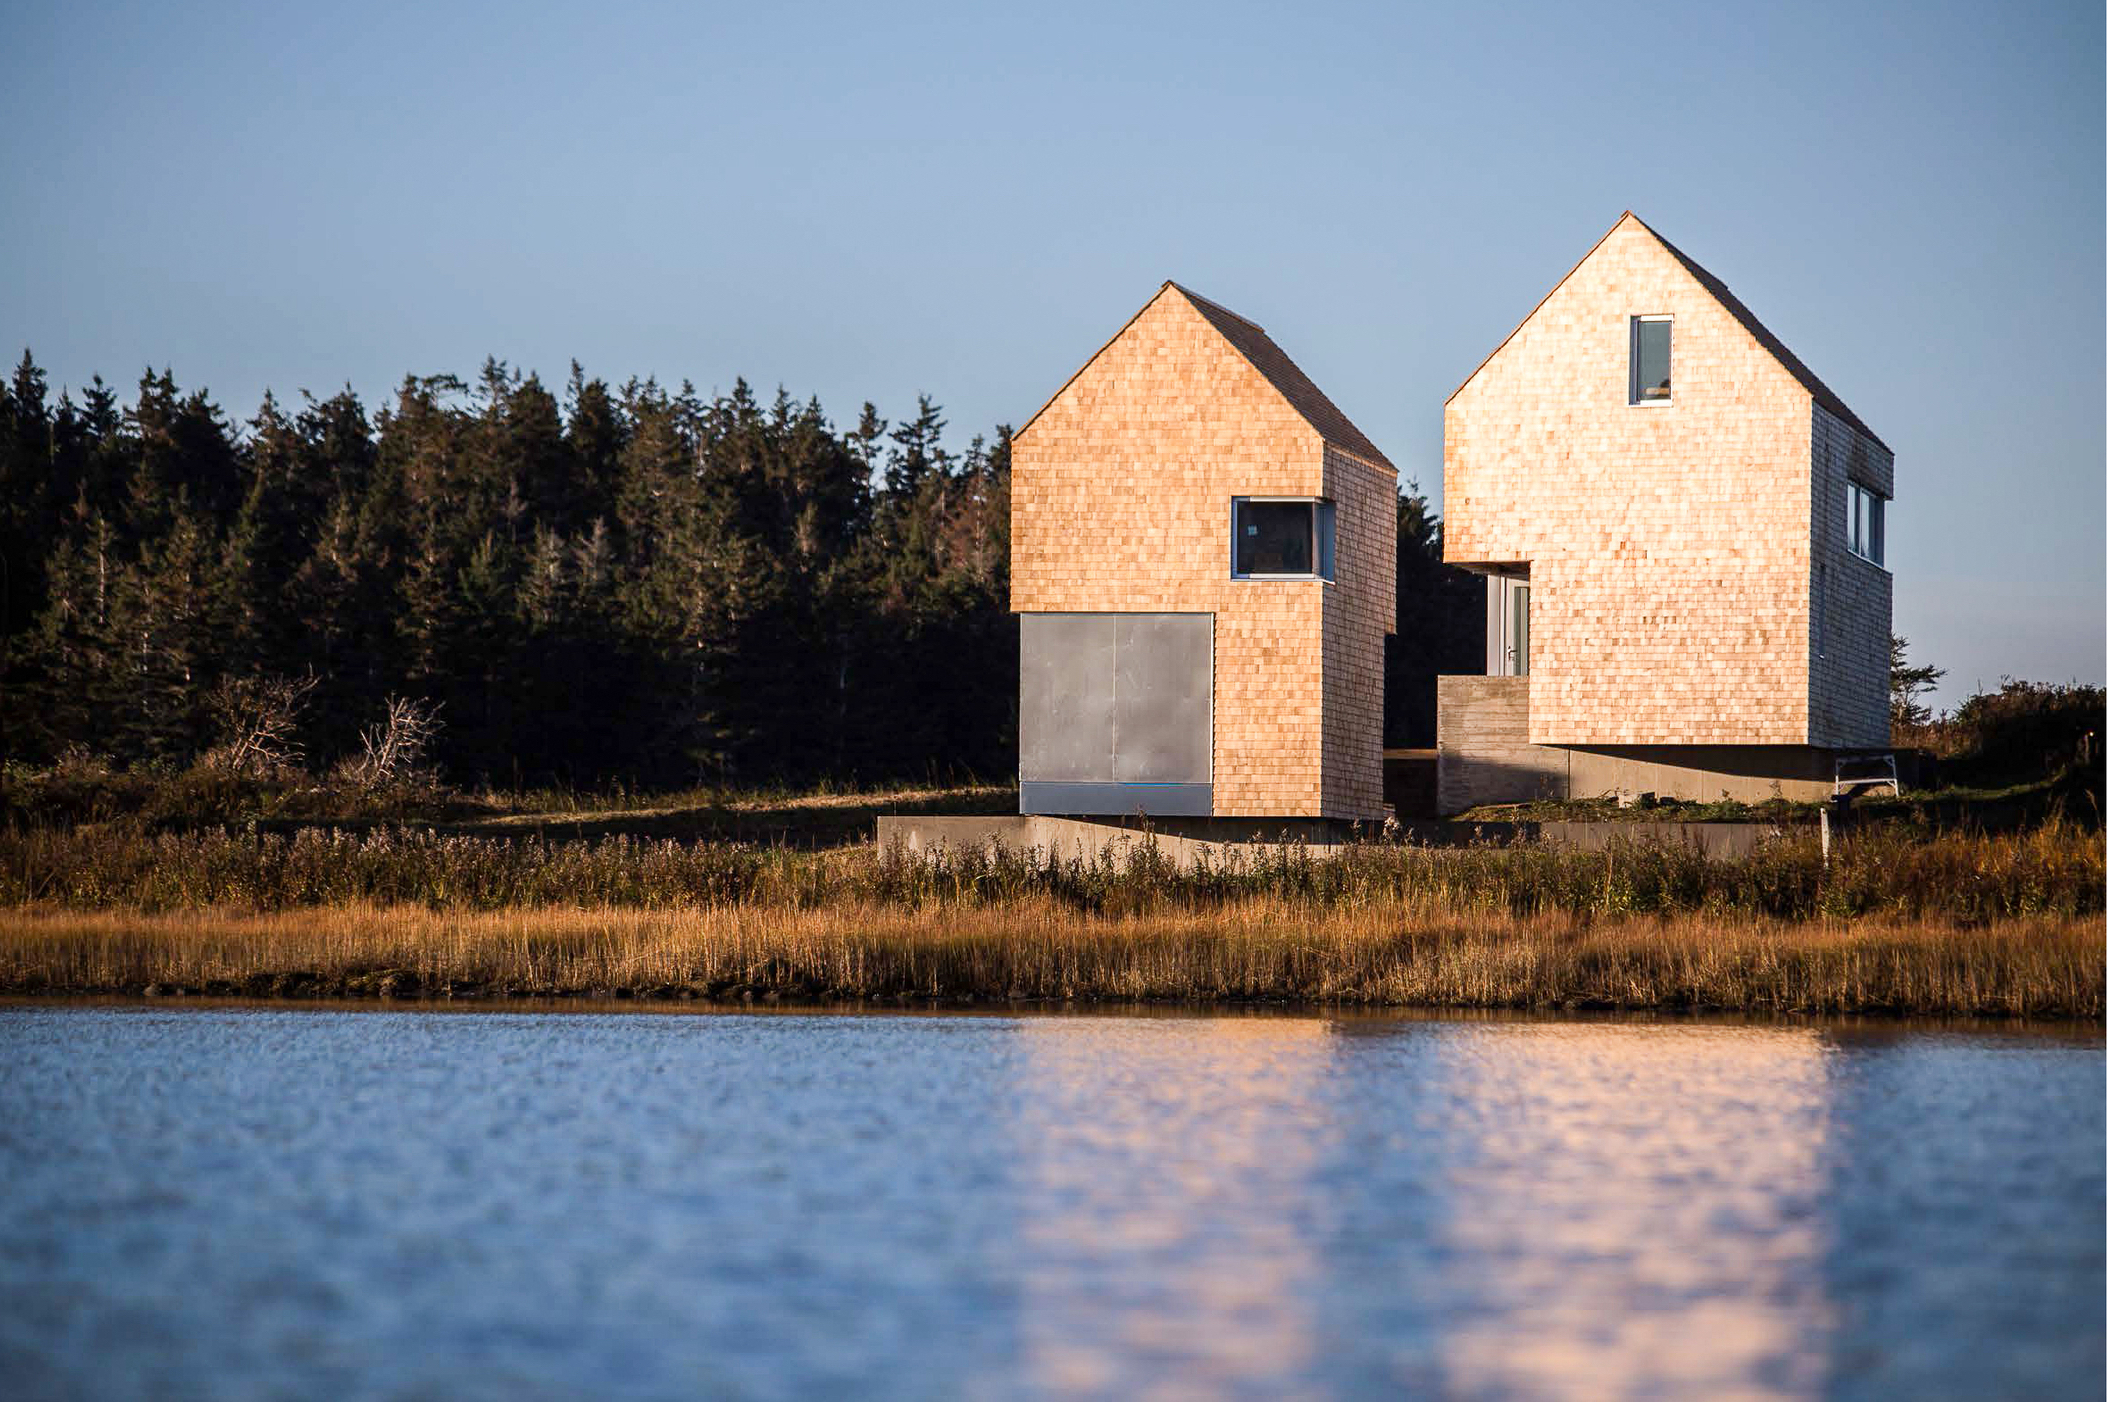 SHOBAC POINT HOUSE - Upper Kingsburg, NS, Canada